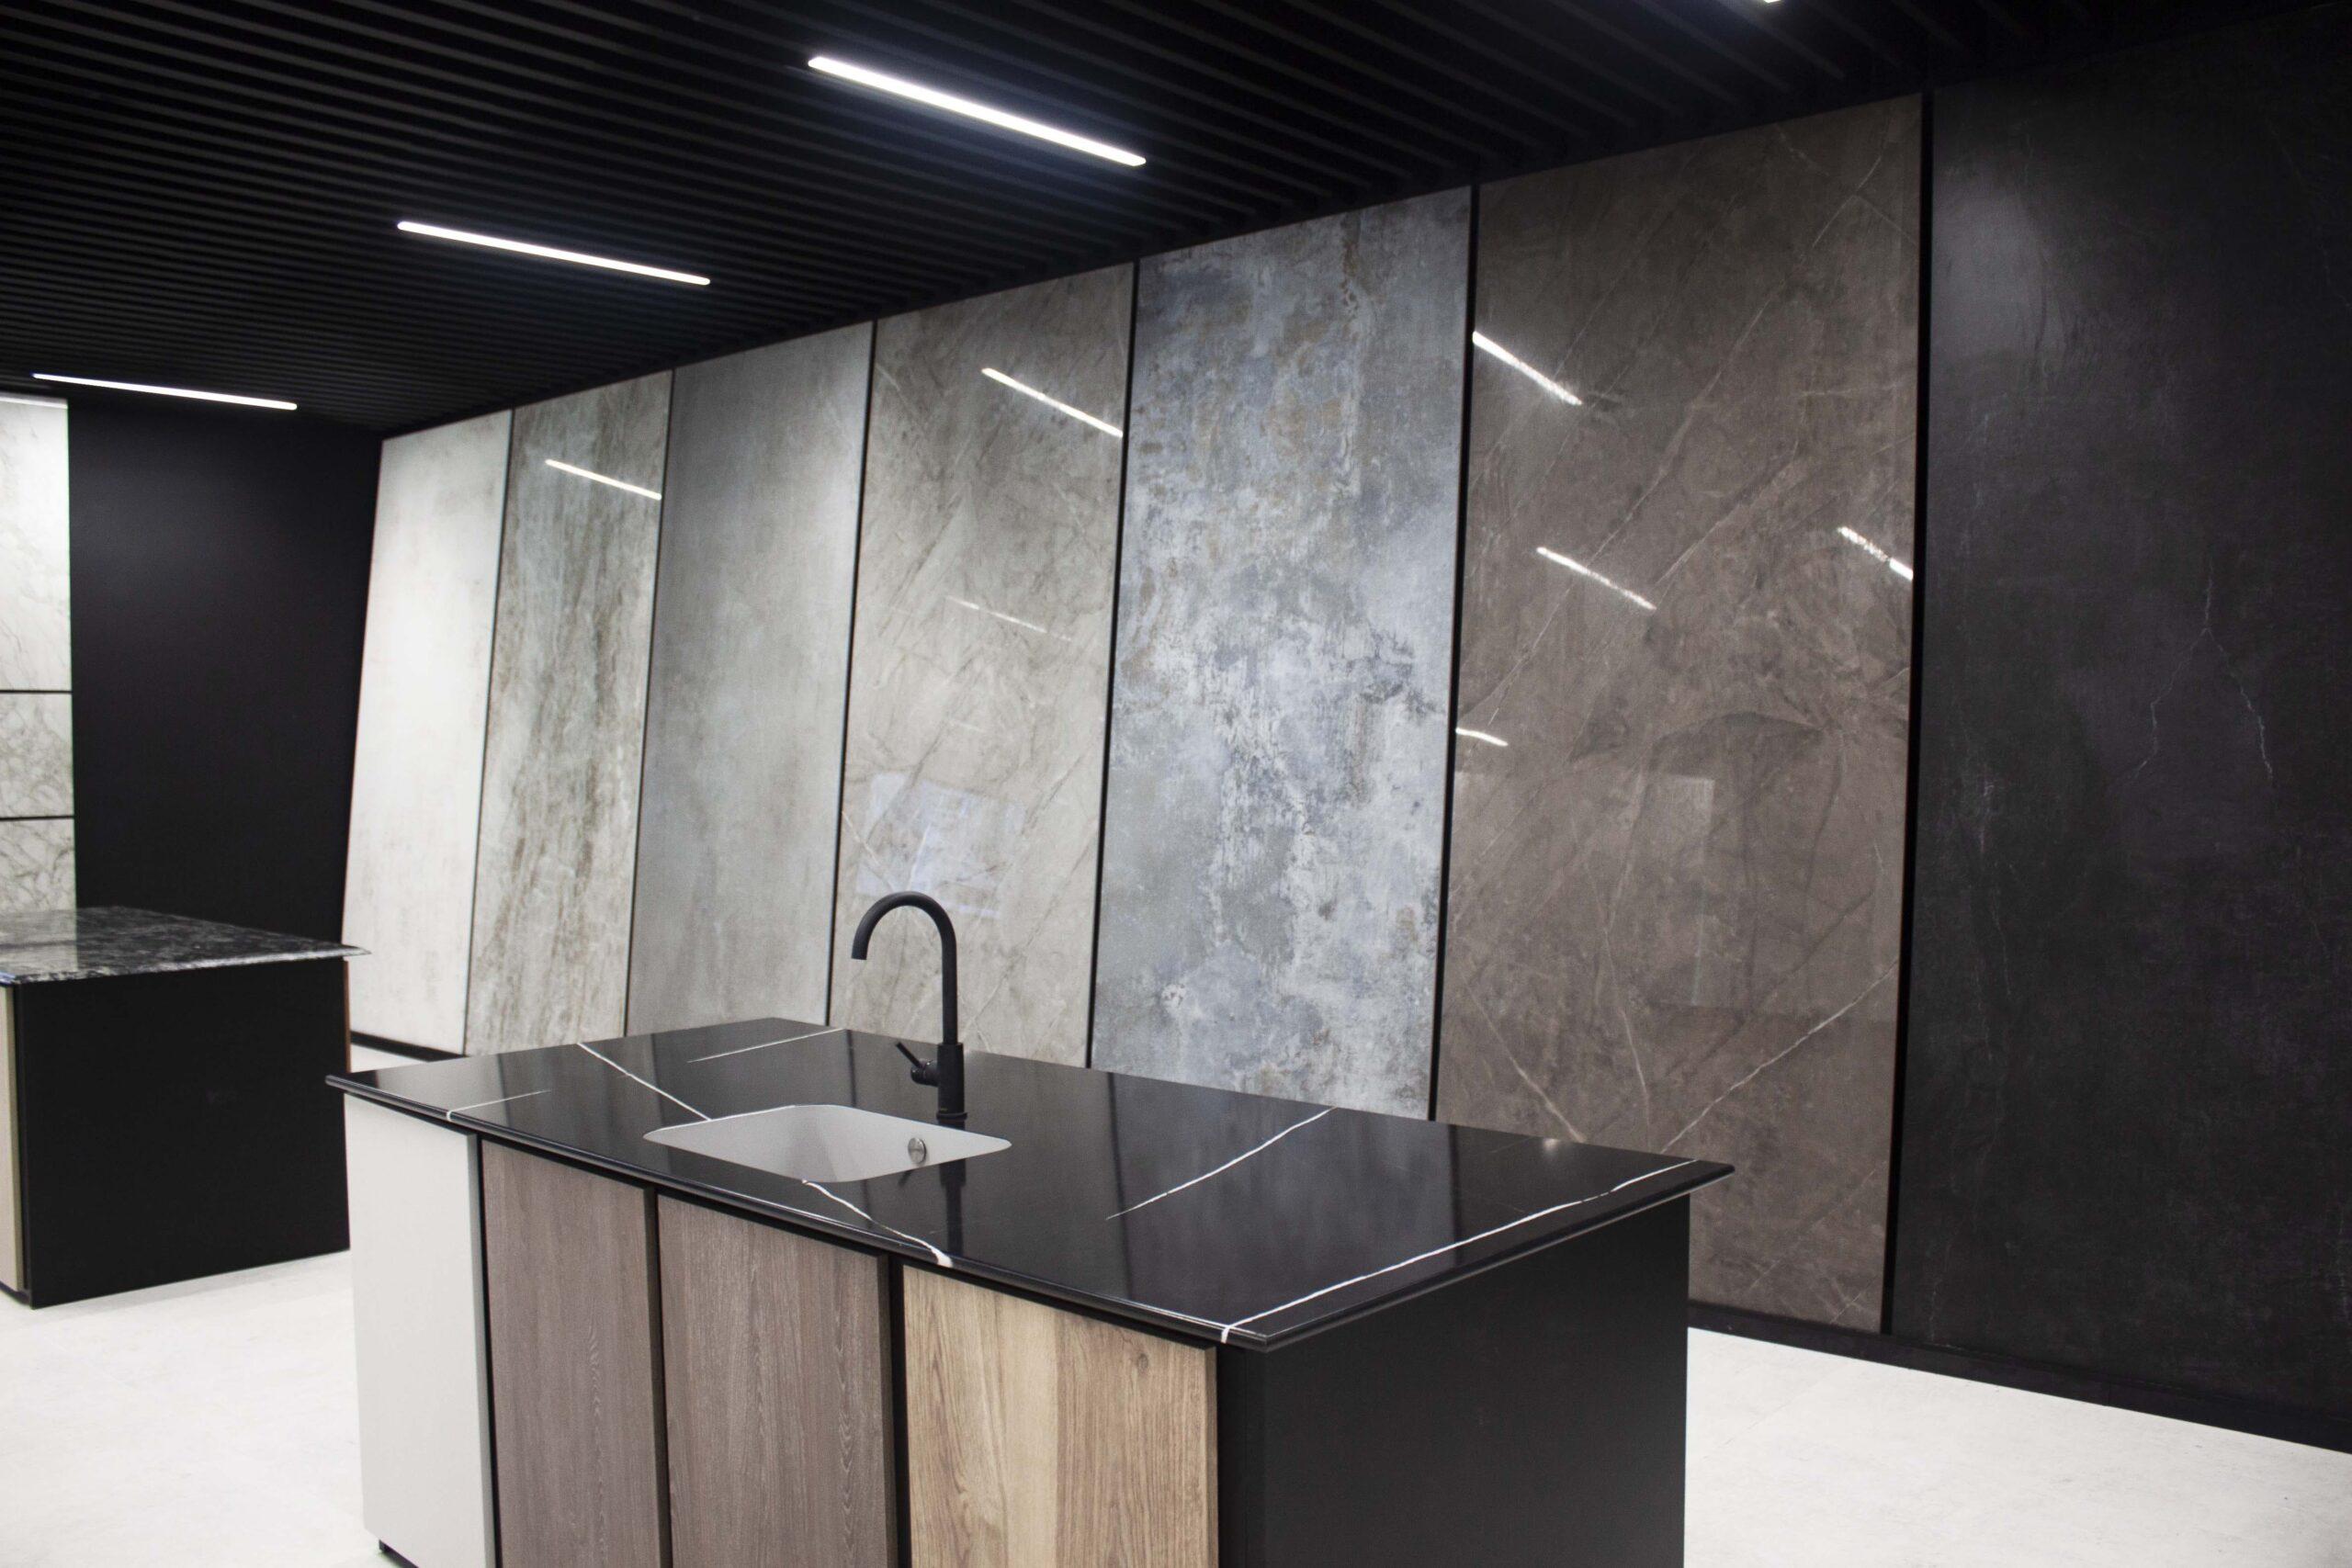 Image of Cosentino Vigo Center Showroom 2 1 scaled in Cosentino Center Vigo undertakes a beautiful renovation - Cosentino